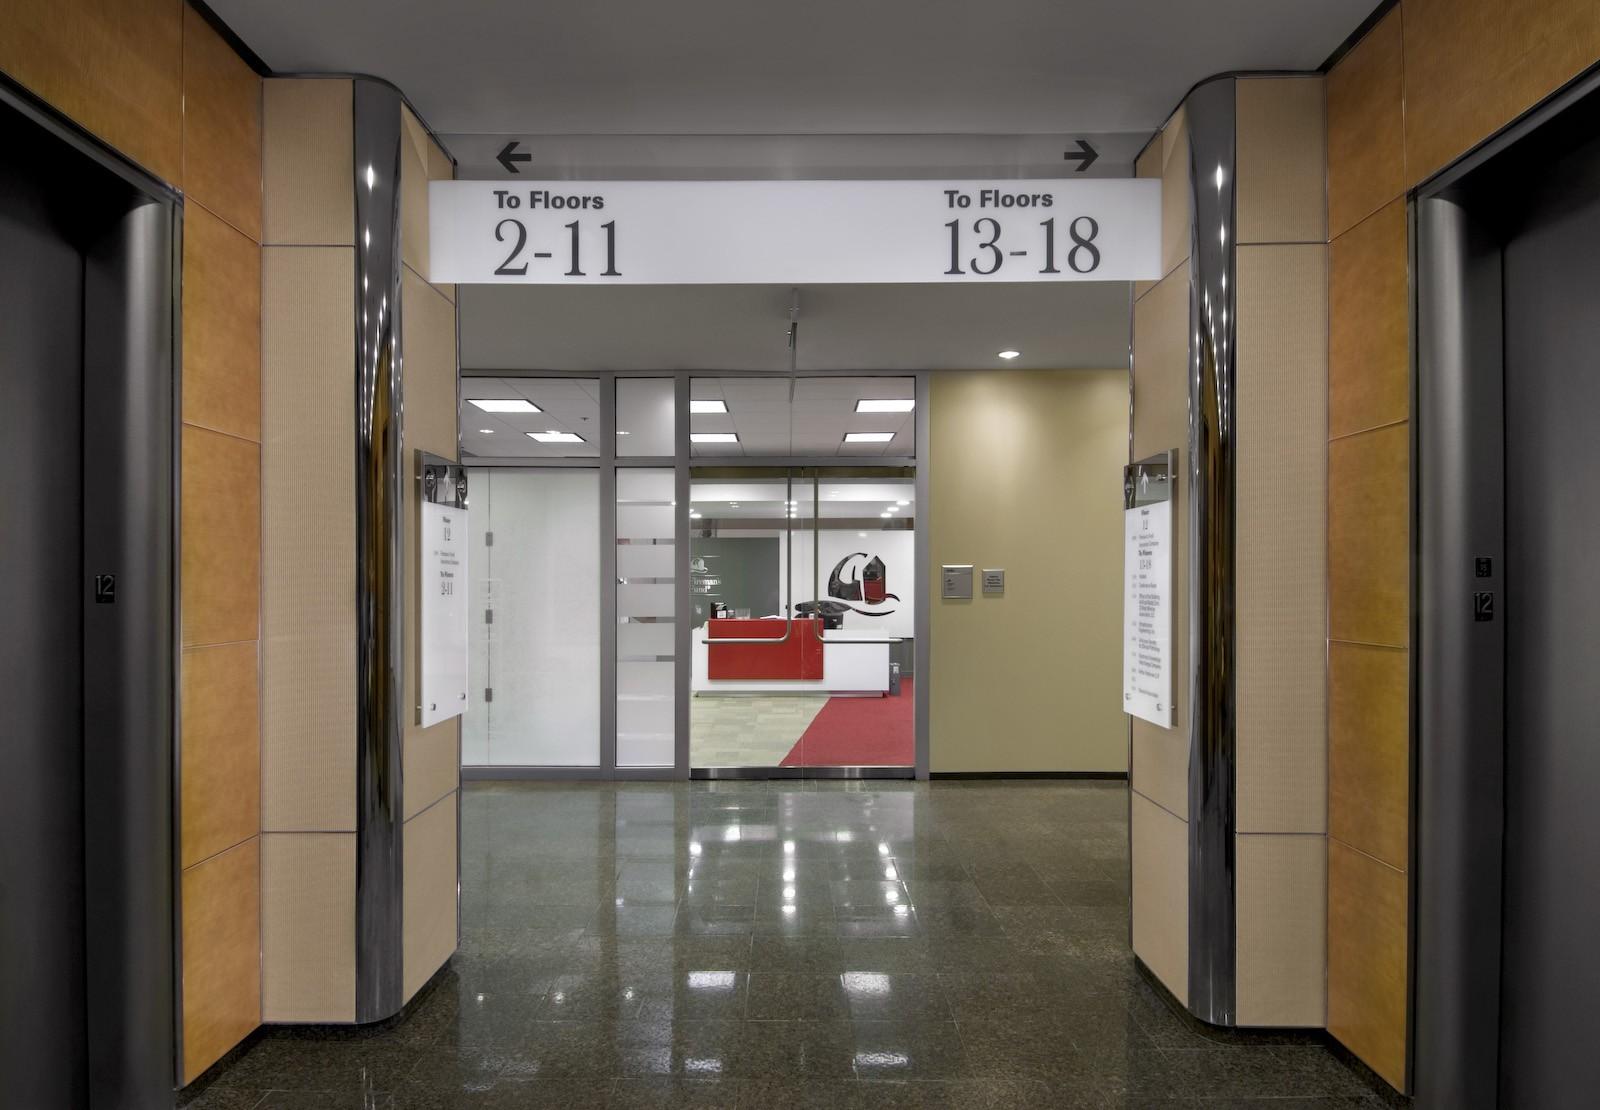 33 W. MonroeChicago 2006ForcadePadgett and Company Job# 2763Image# 05